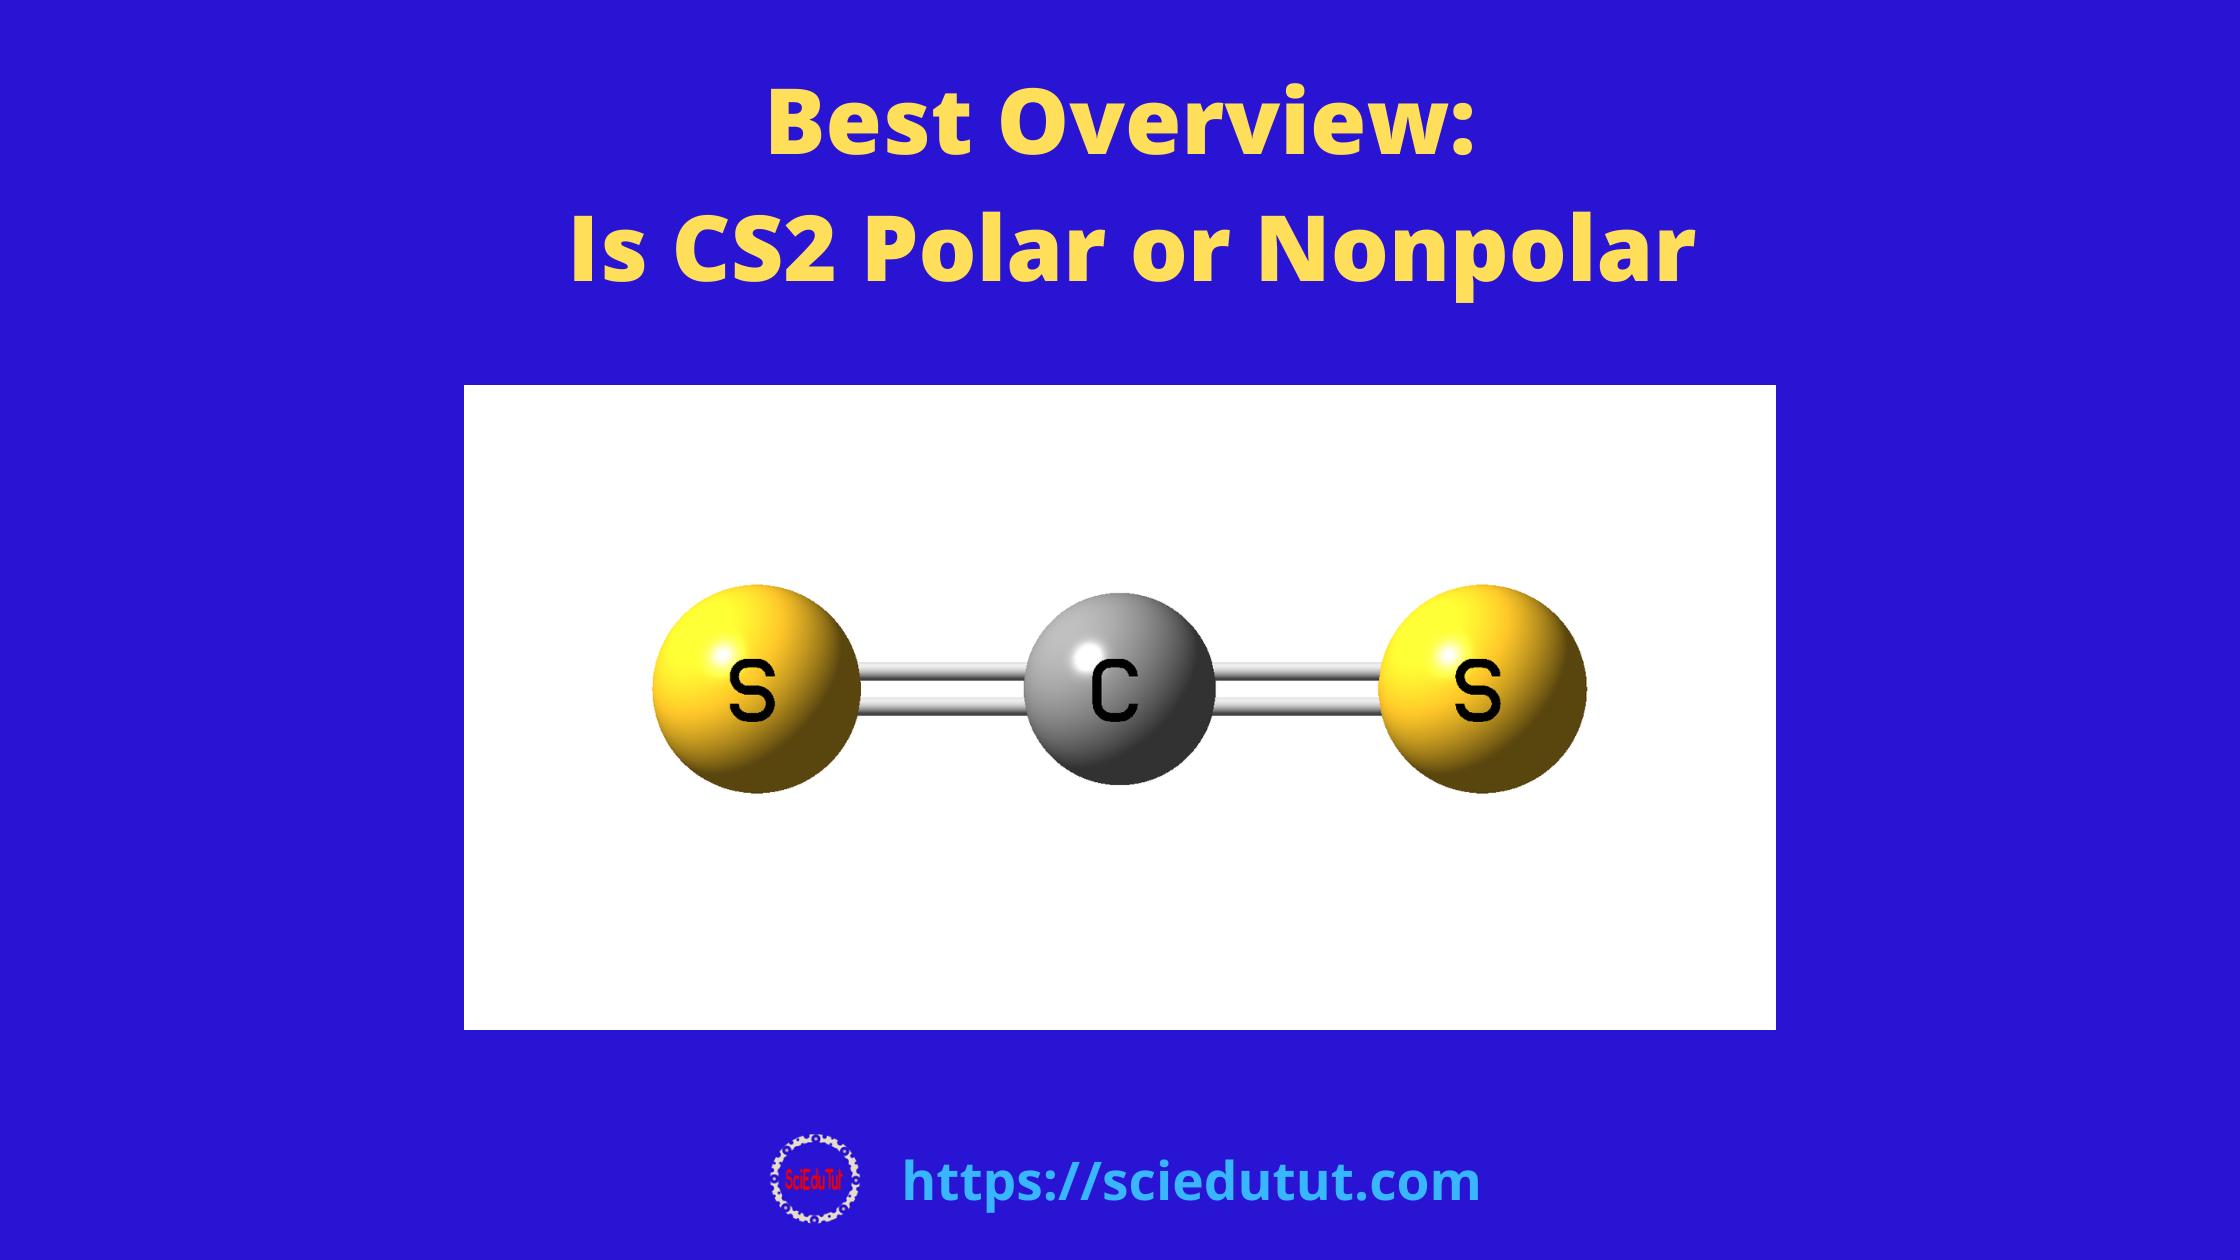 Best Overview: Is CS2 Polar or Nonpolar?